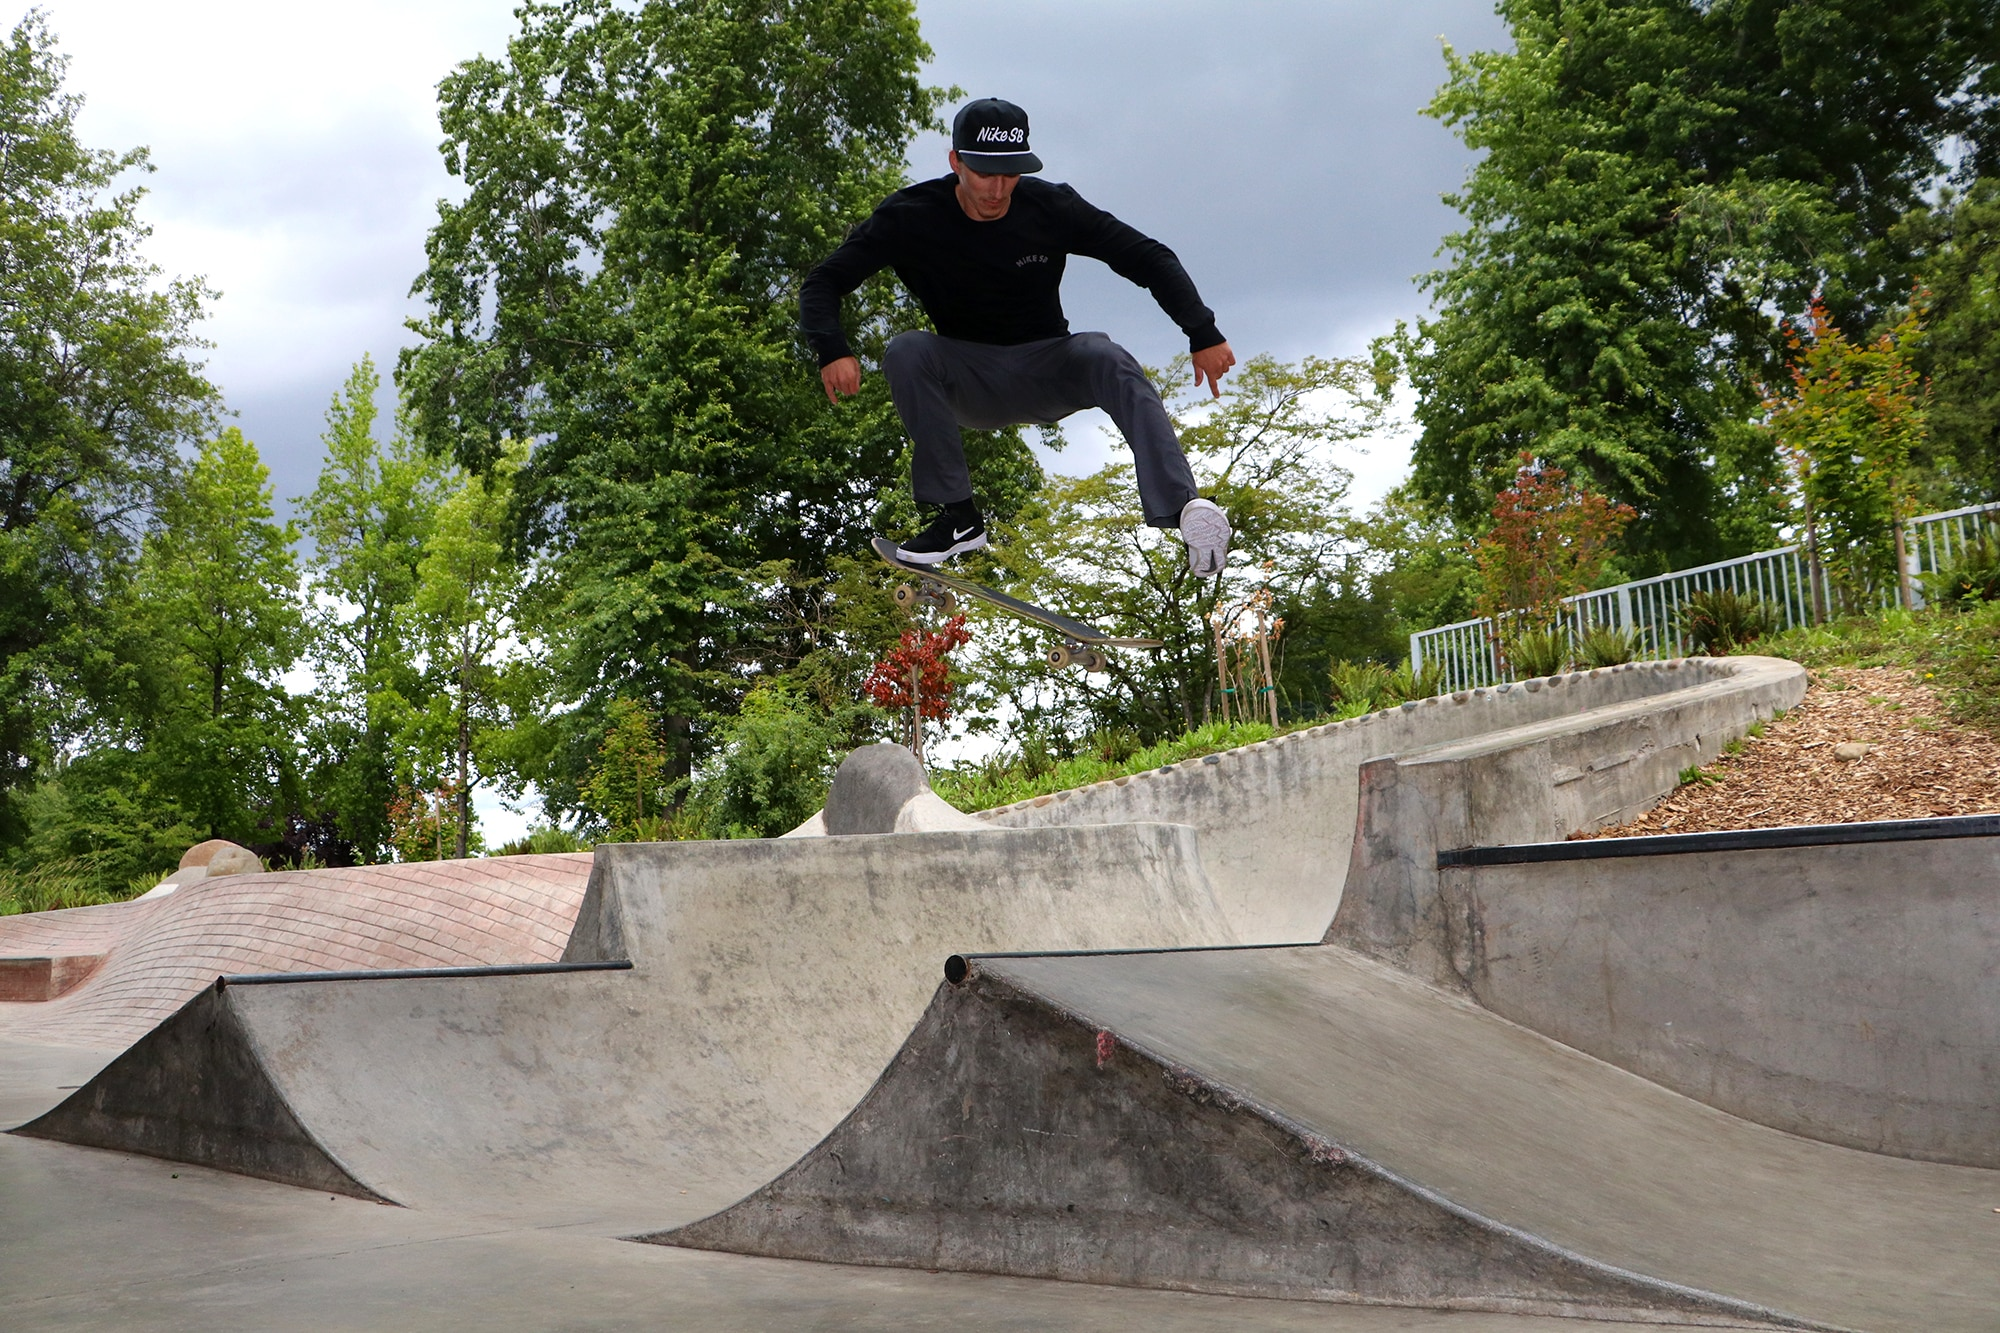 carta colisión Benigno  Nike SB Janoski Hyperfeel Skate Shoes Wear Test Review | Tactics